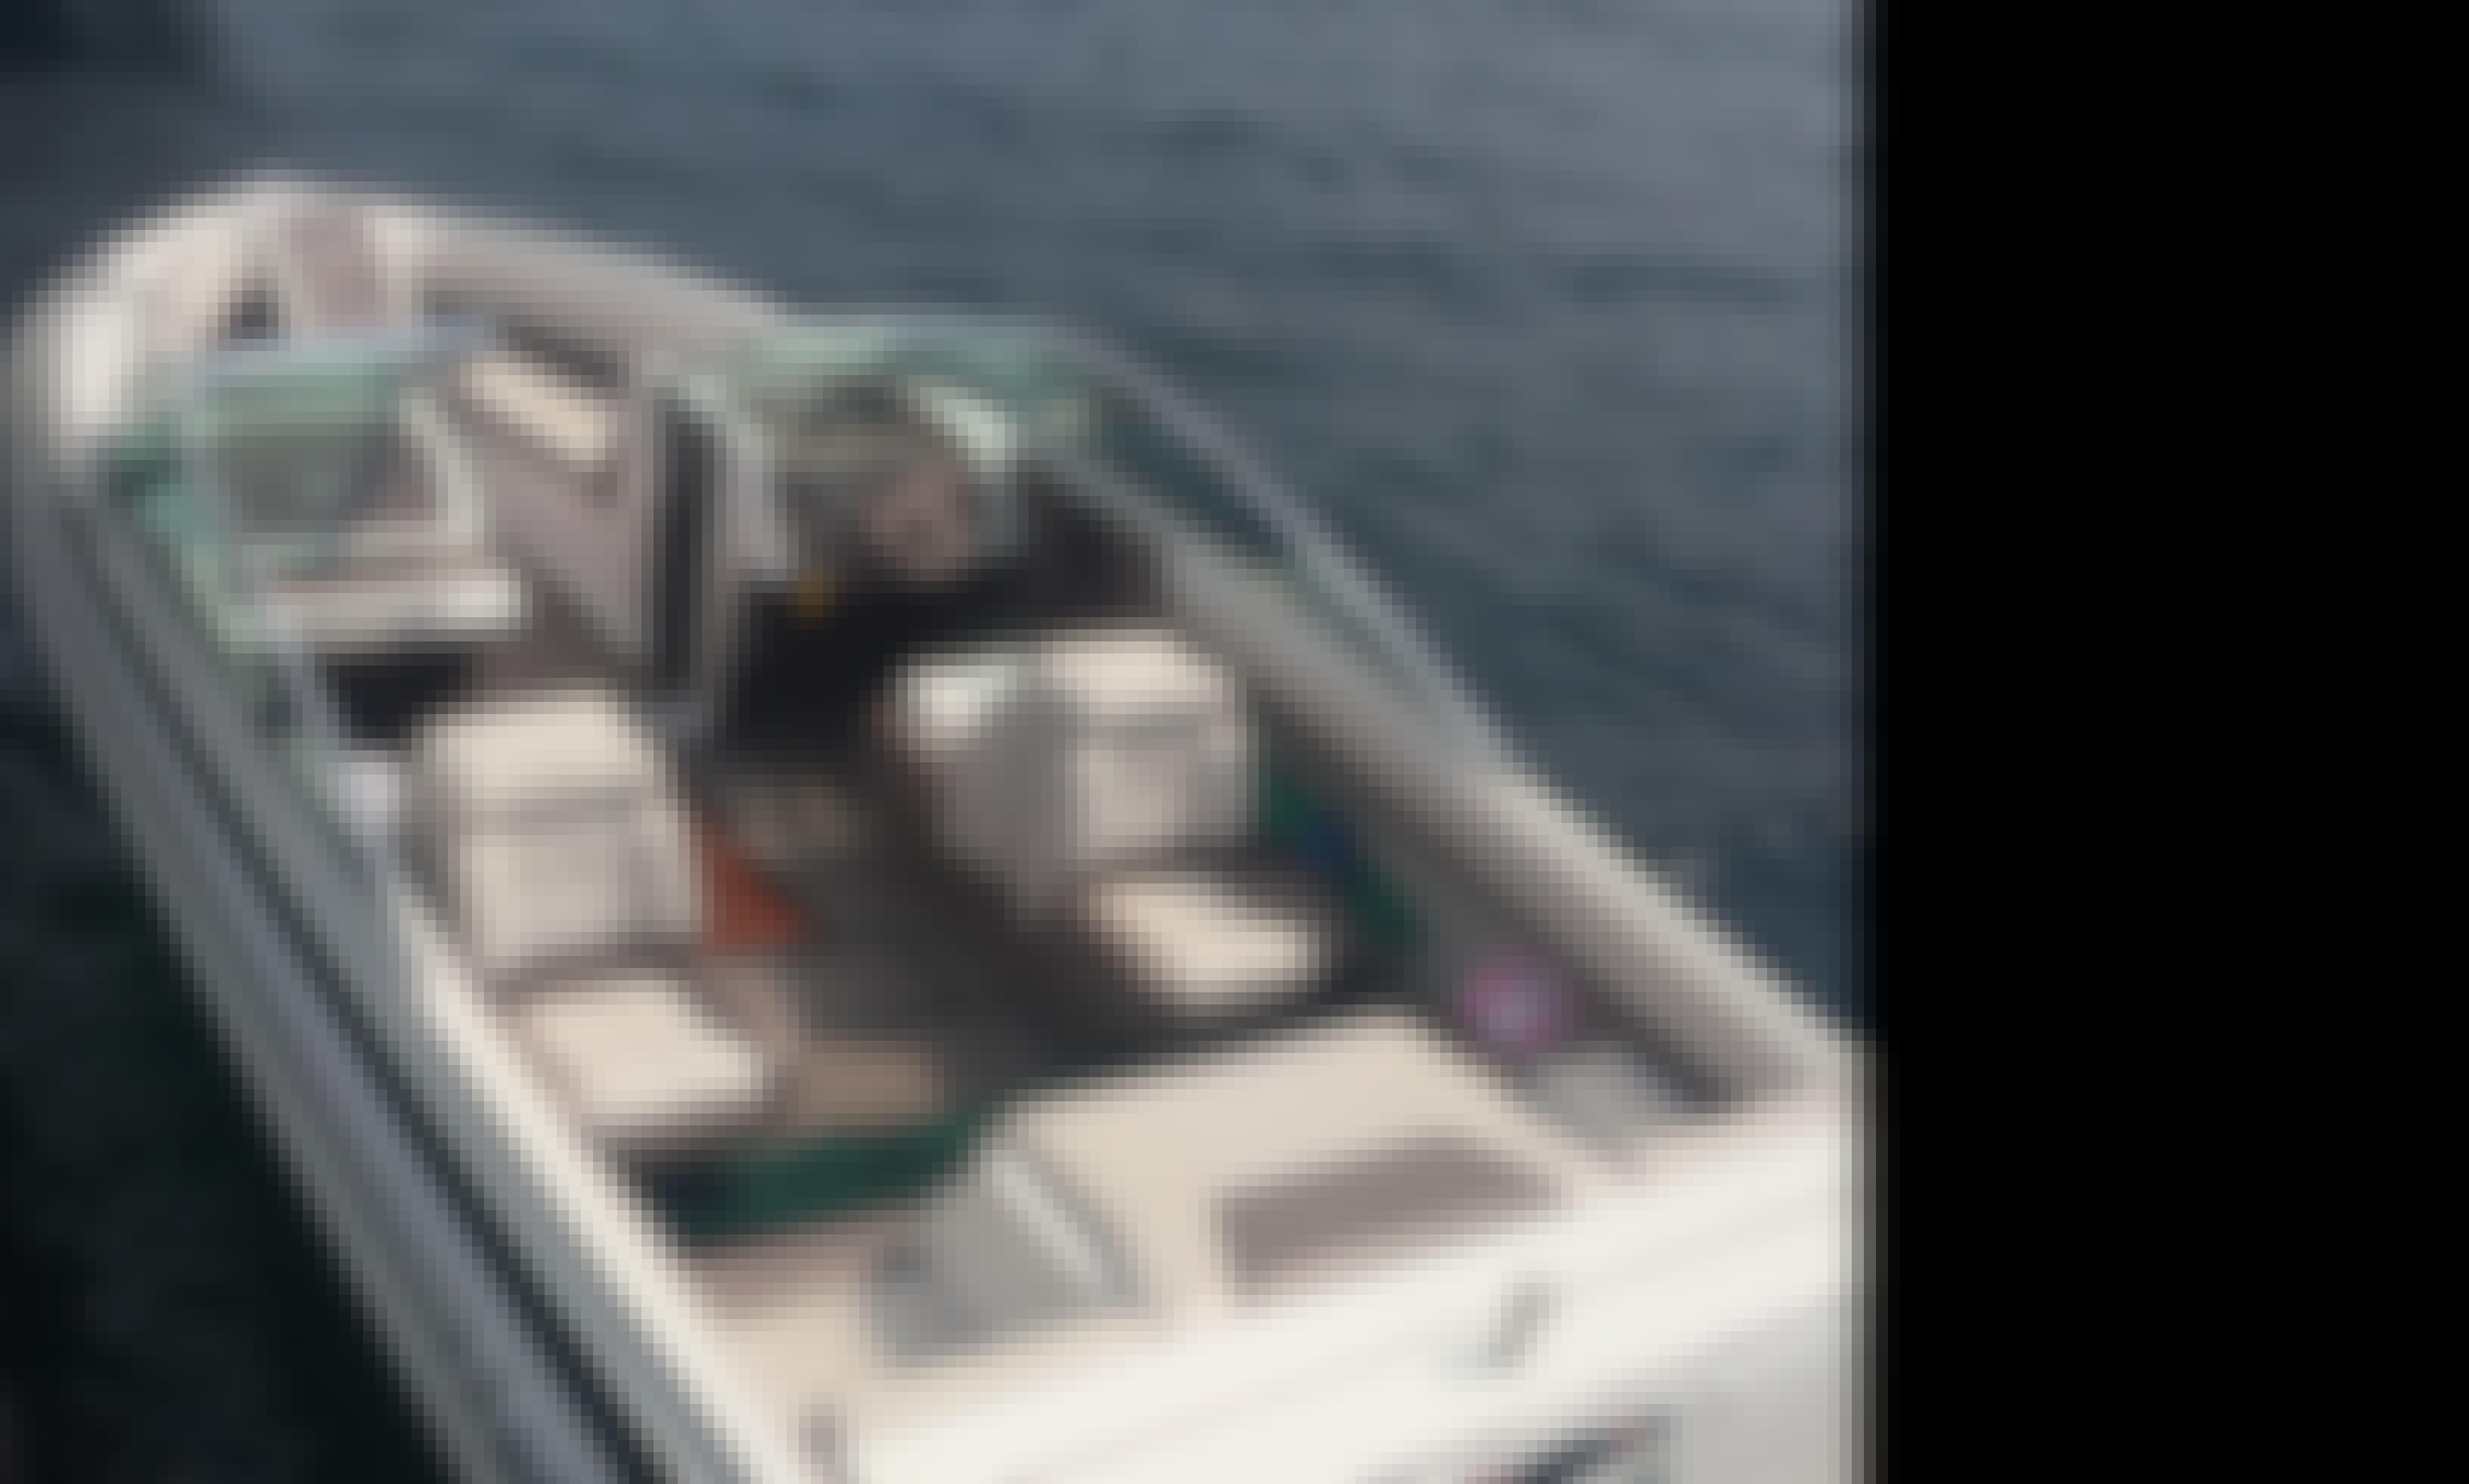 Lake Tahoe Luxury Boating! Book the 21' Cobalt Powerboat for 6 People!